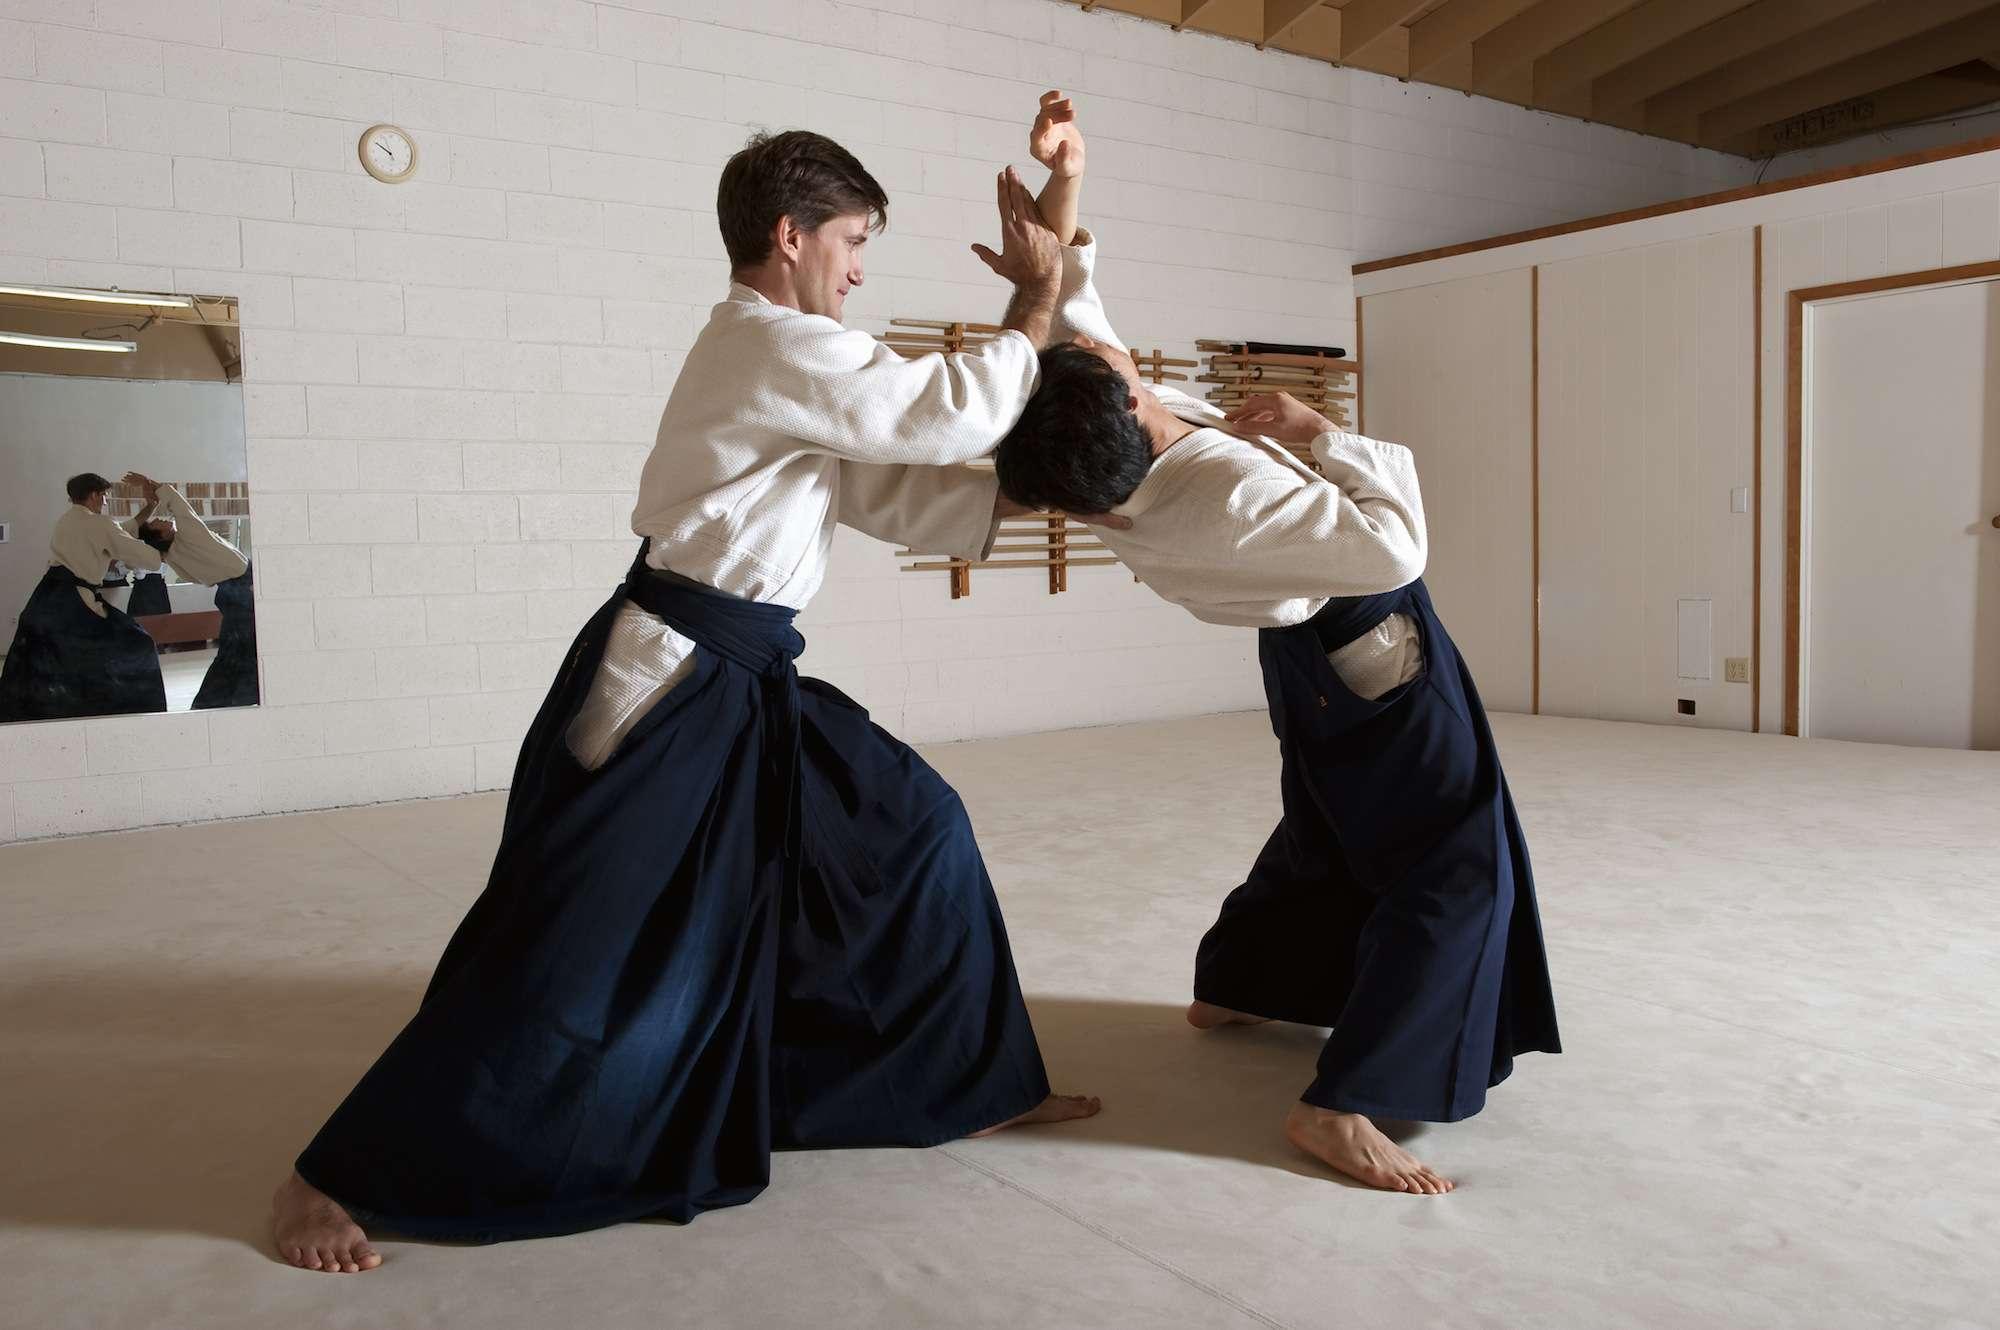 Men practicing aikido martial arts